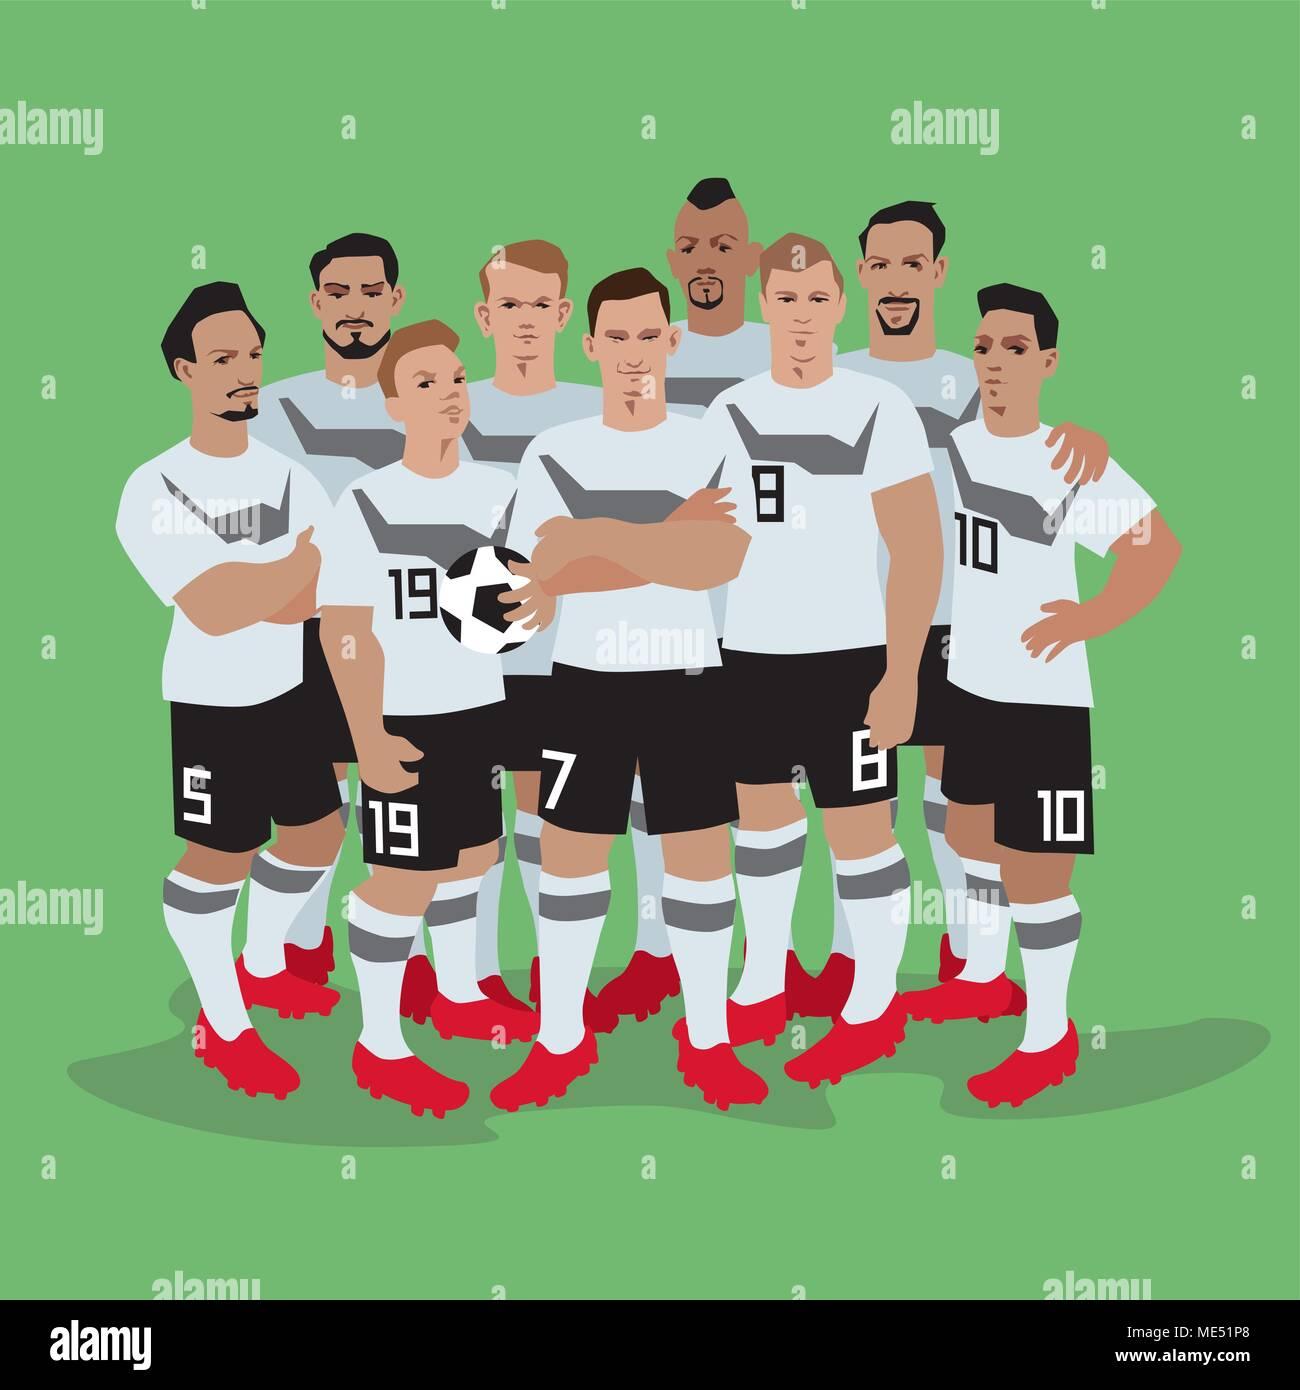 Germany Soccer / Football team players. - Stock Vector